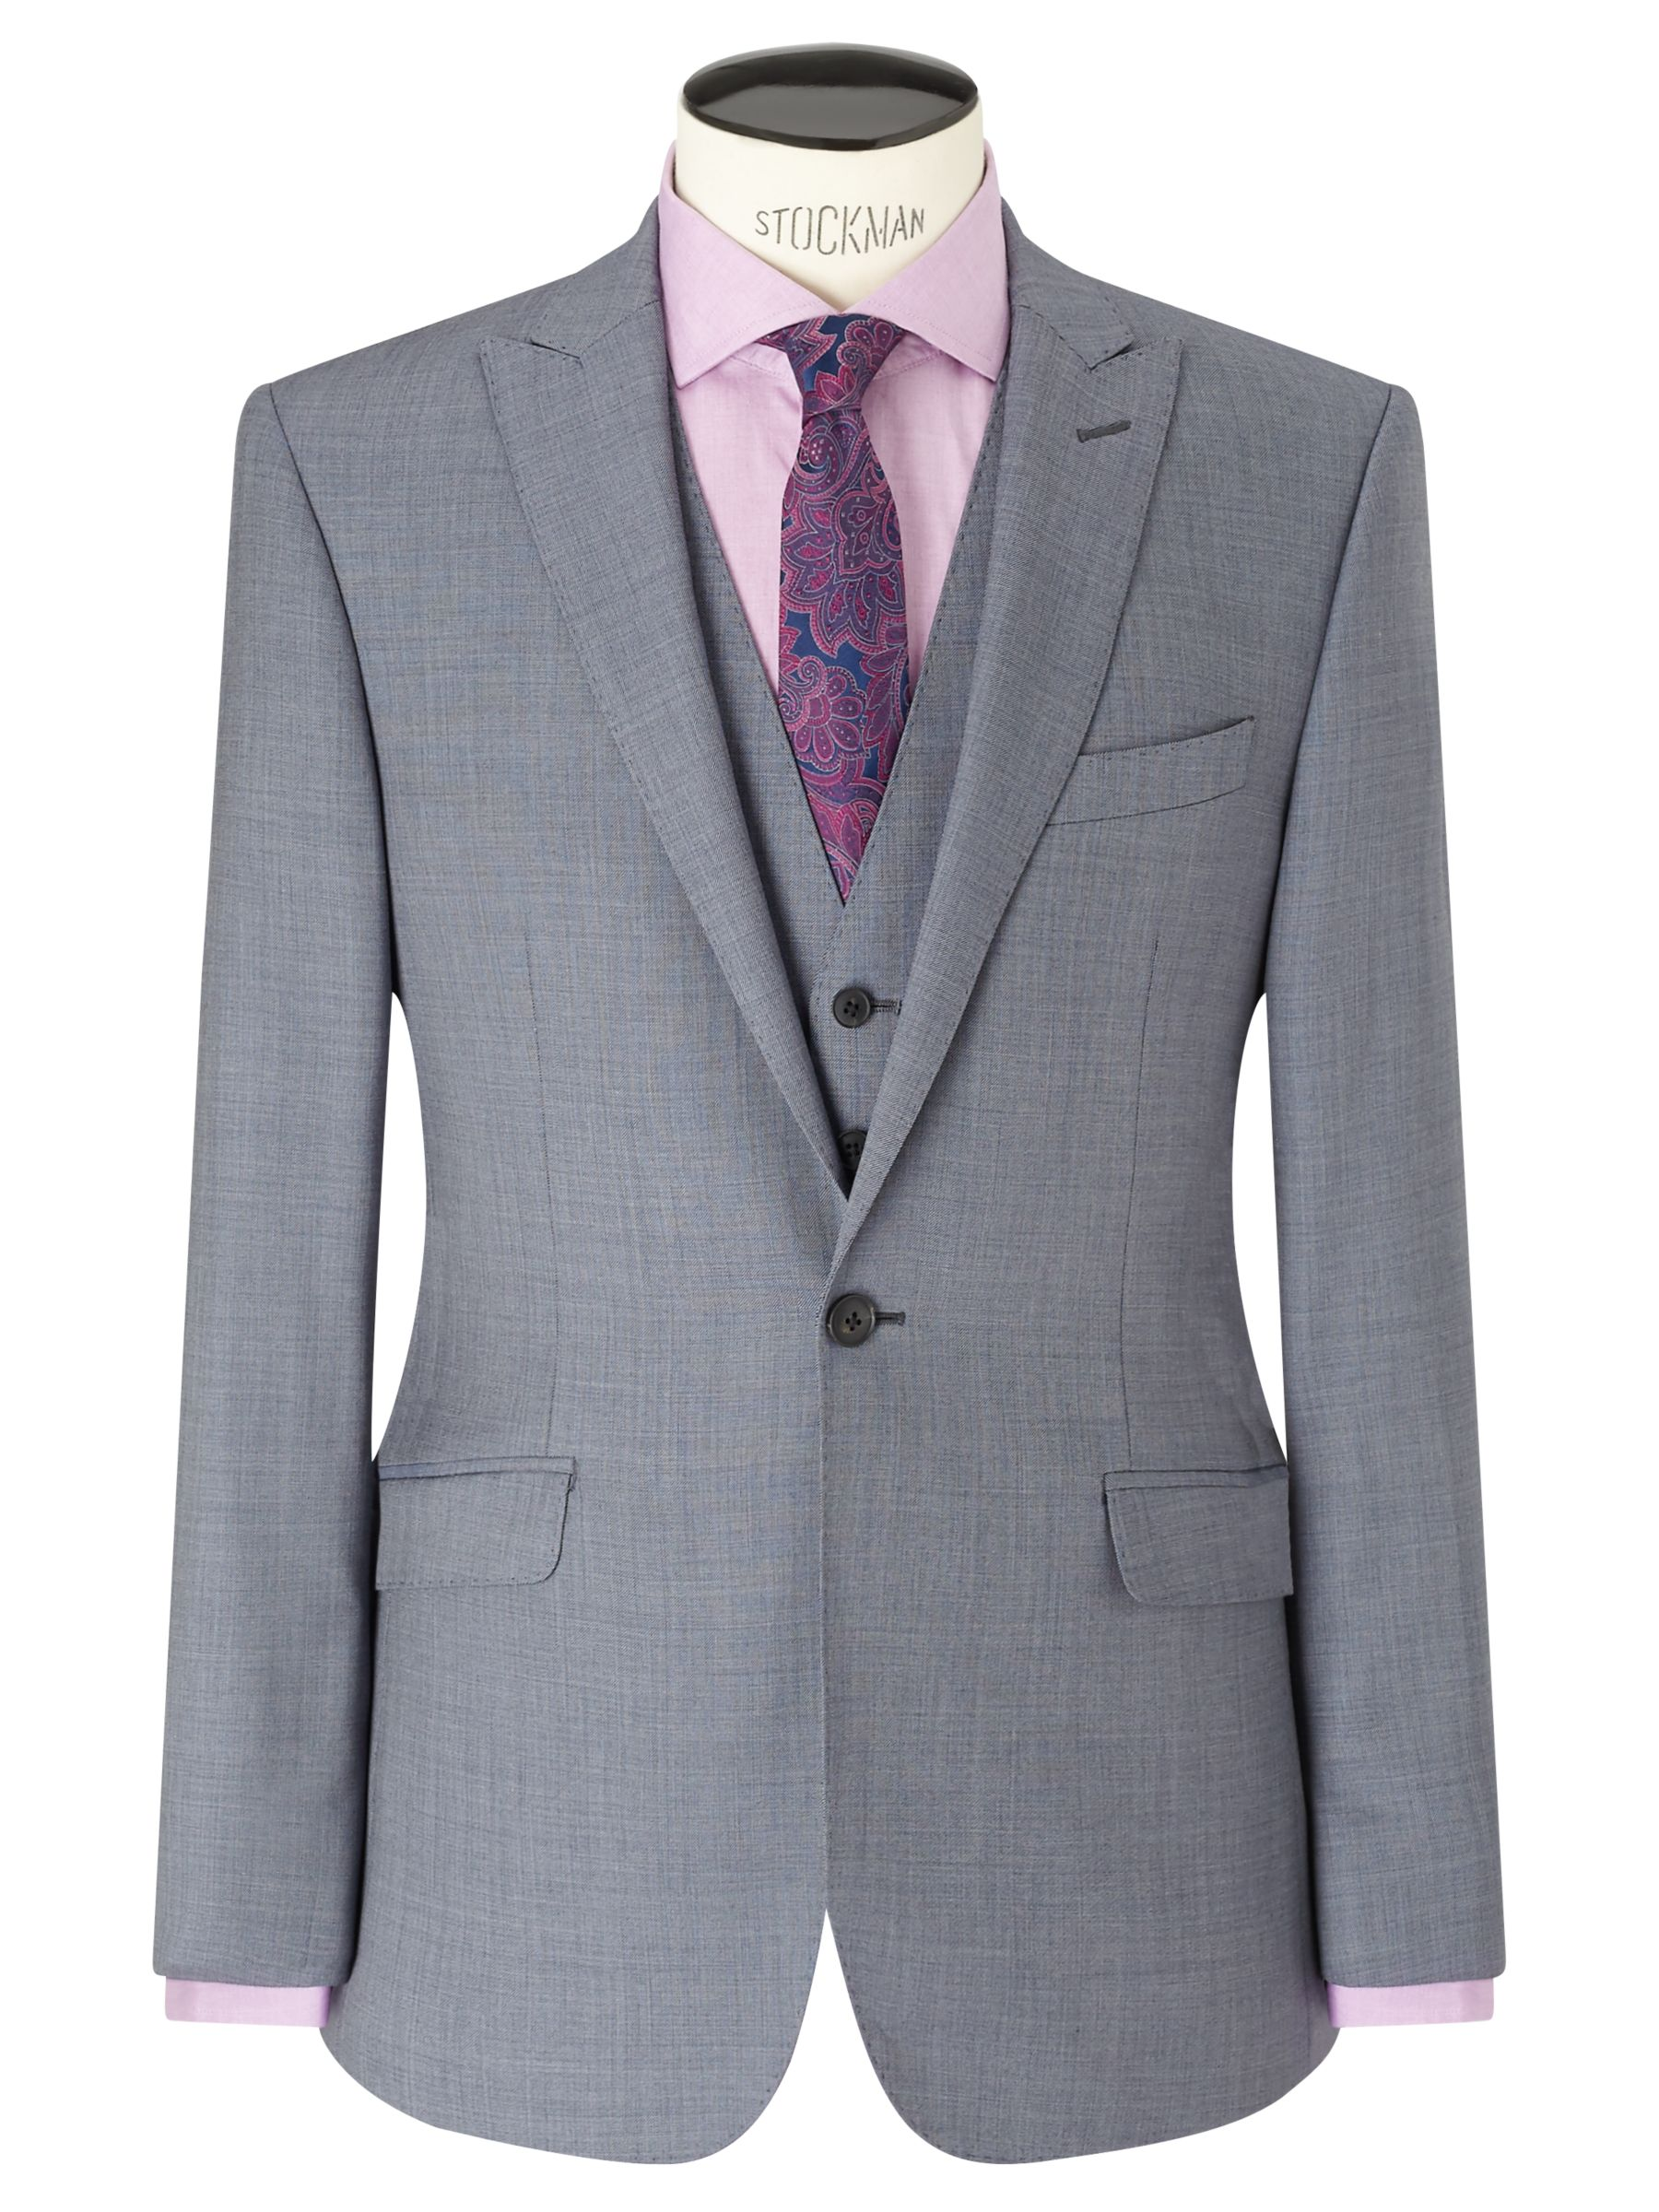 Richard James Mayfair Richard James Mayfair Wool Sharkskin Slim Fit Suit Jacket, Slate